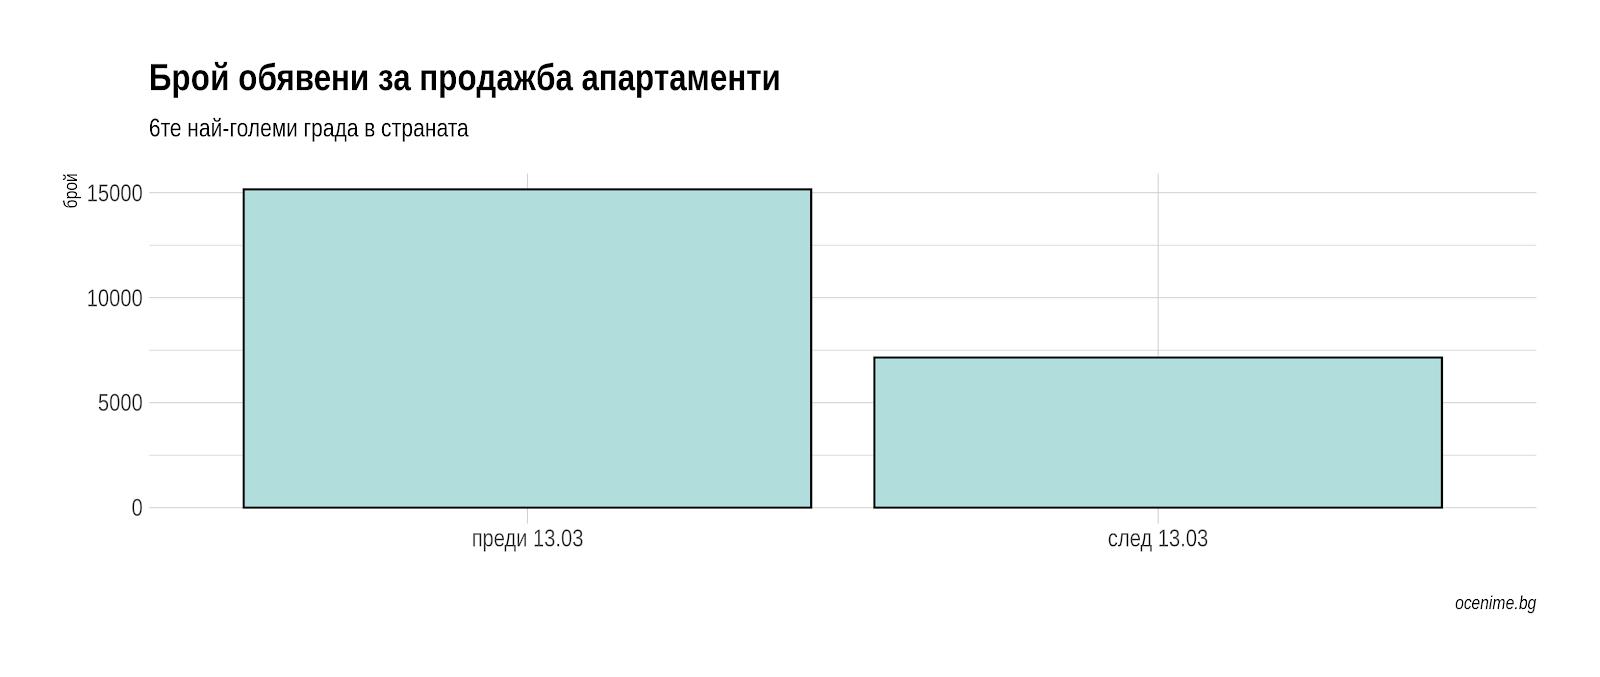 Брой обявени за продажба апартаменти - преди и след Covid-19 - Оцениме.бг